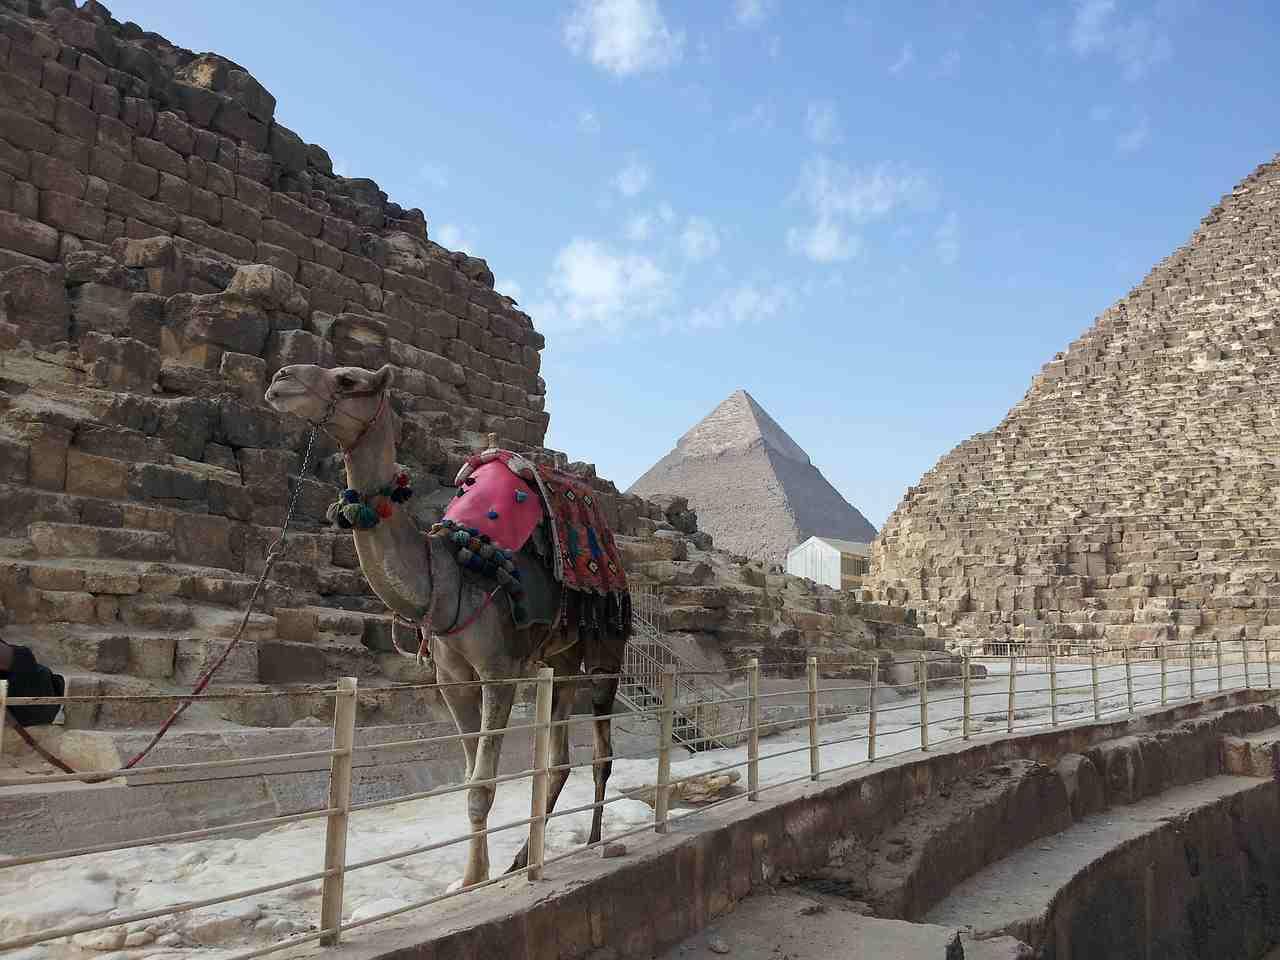 Camelo e as Pirâmides de Gizé